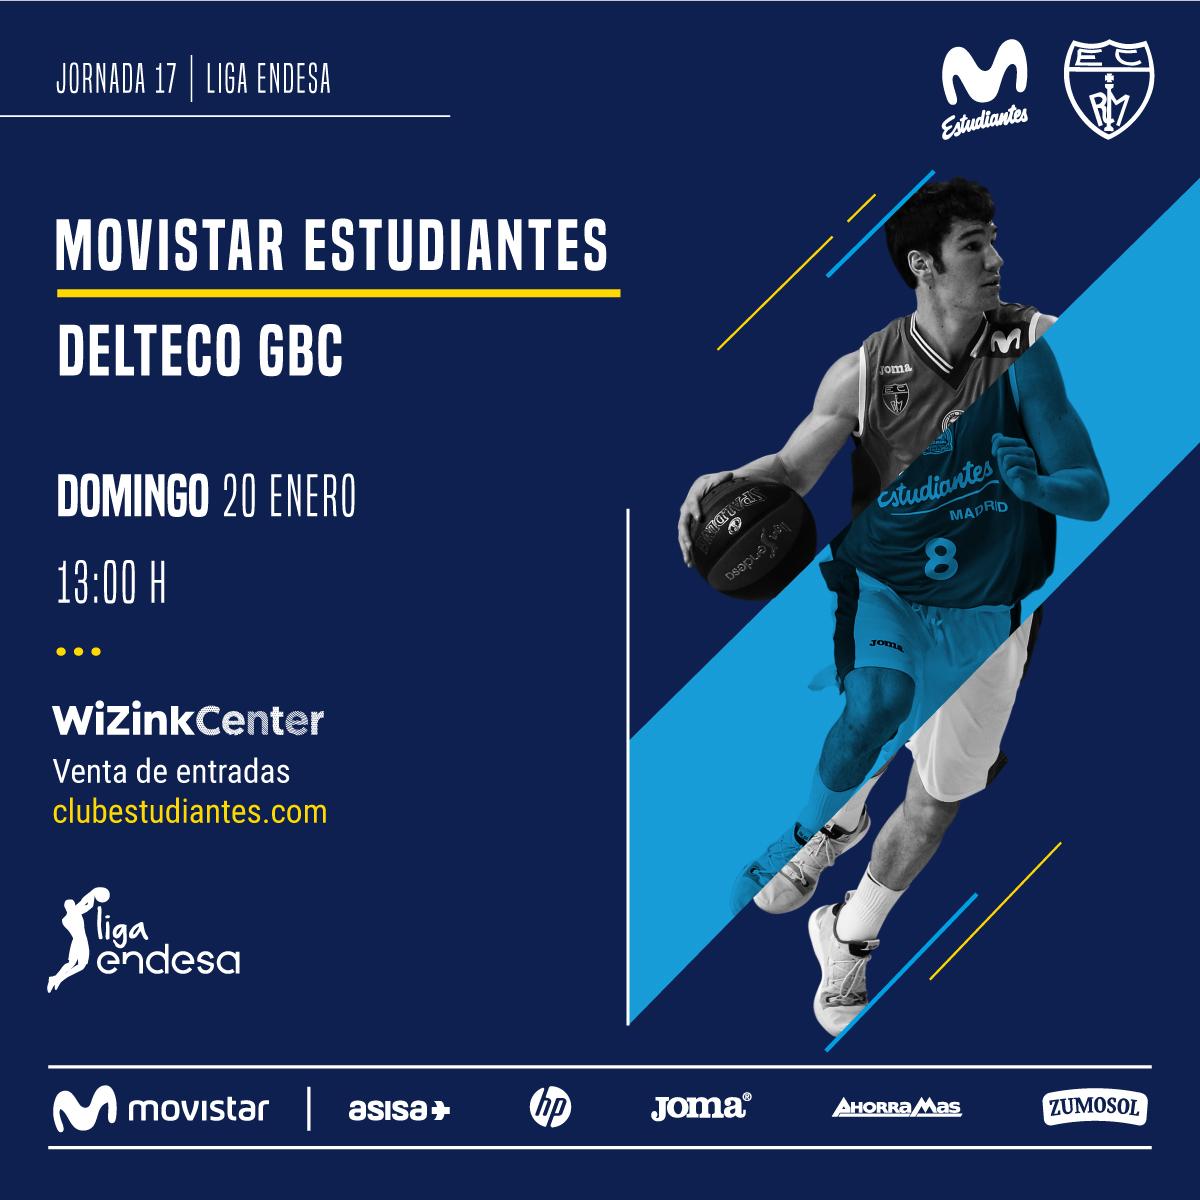 Movistar Estu – Delteco GBC, 20 enero 13h